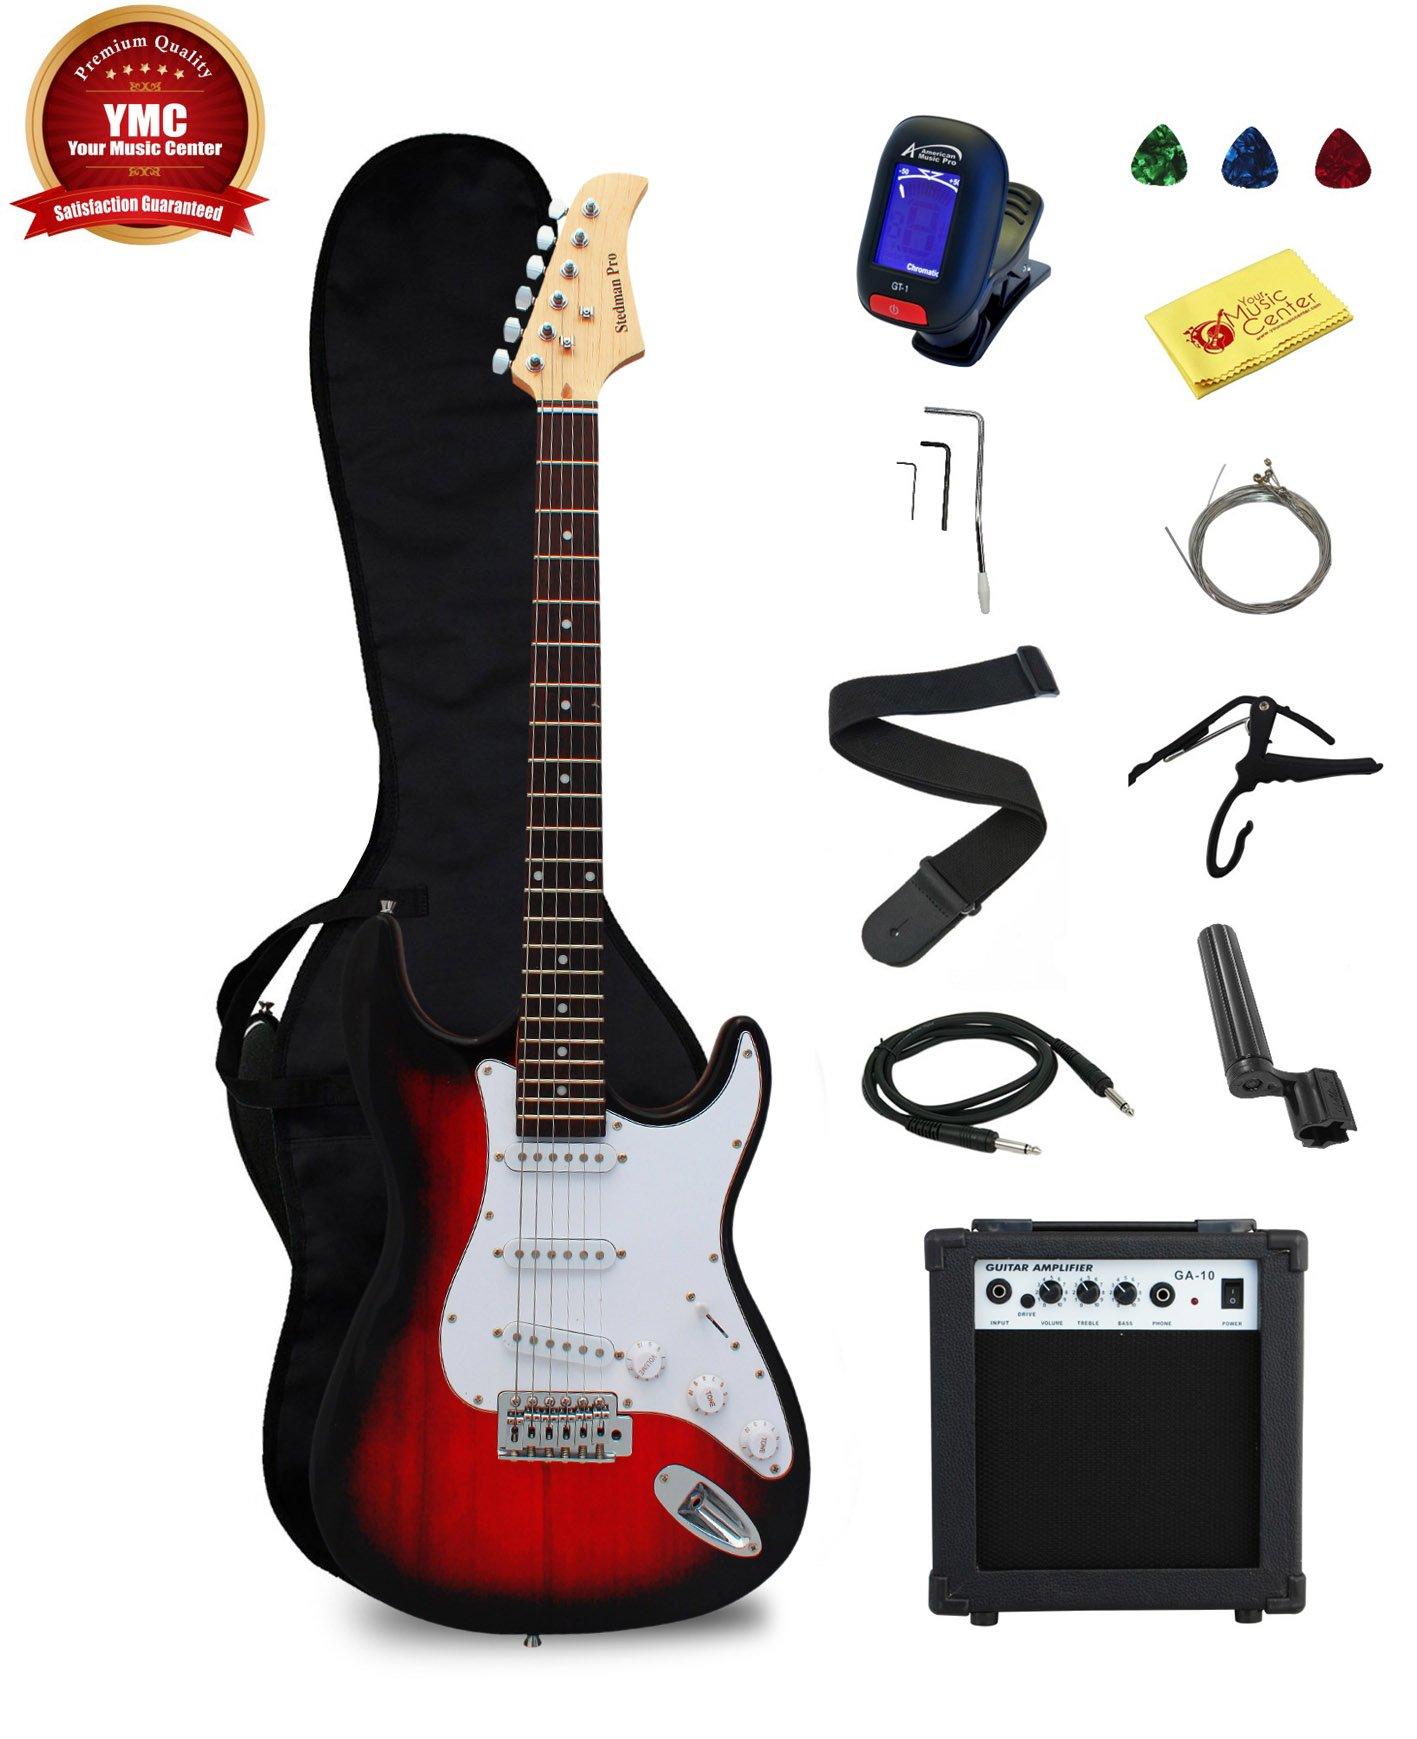 Stedman Pro Principiante Series 39-inch Guitarra Eléctrica con de ...